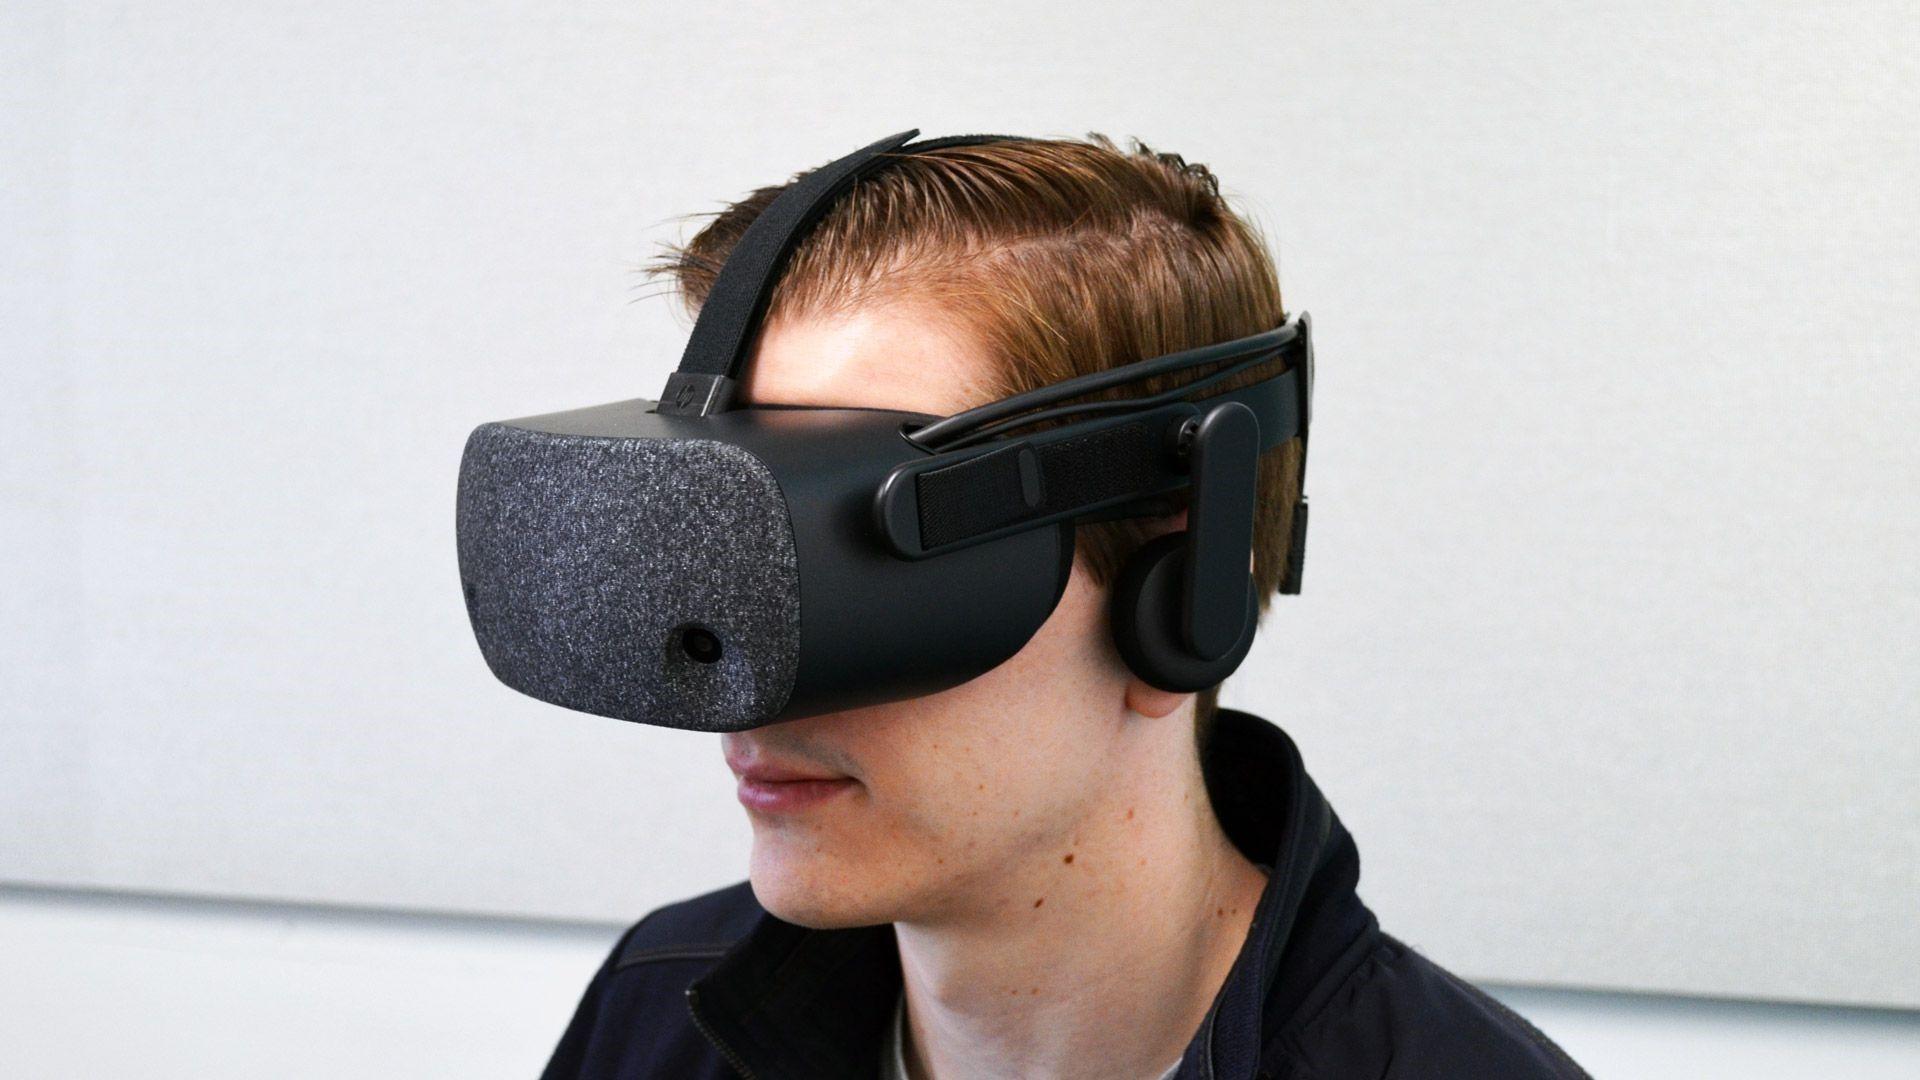 Oculus Quest Oculus Quest Update Time Vr headset